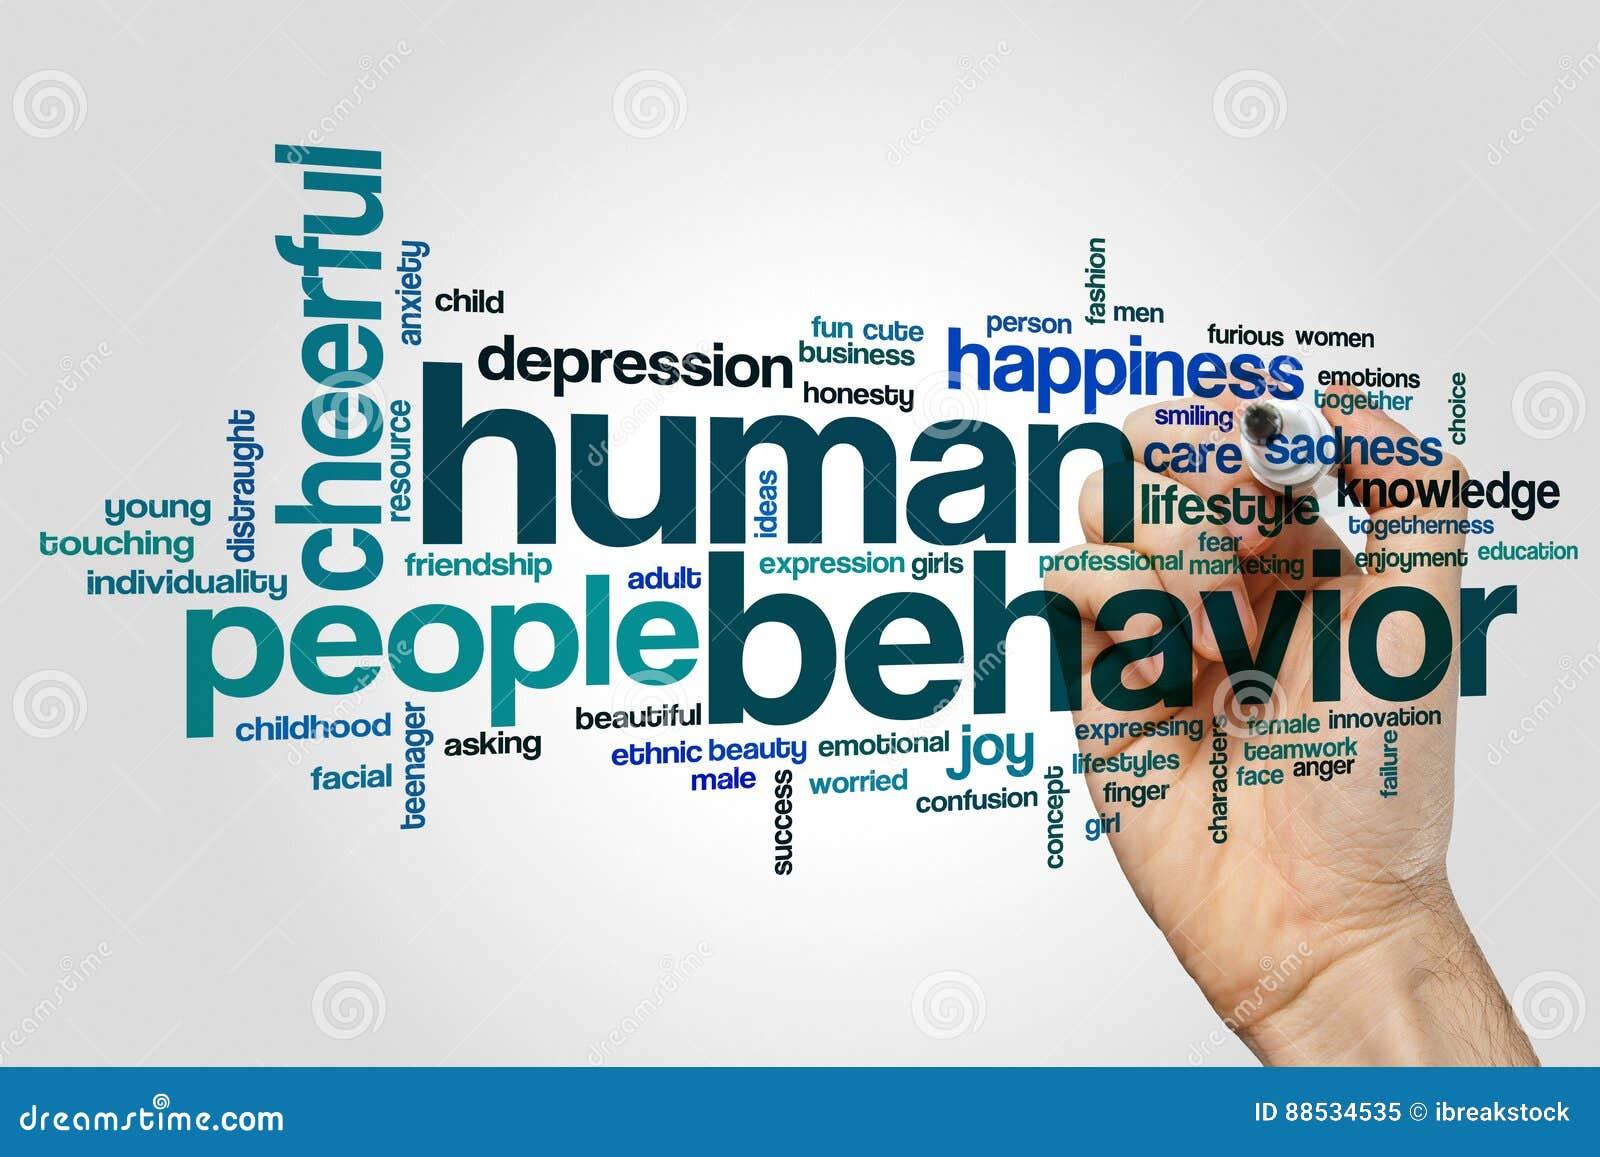 behavior human Adult